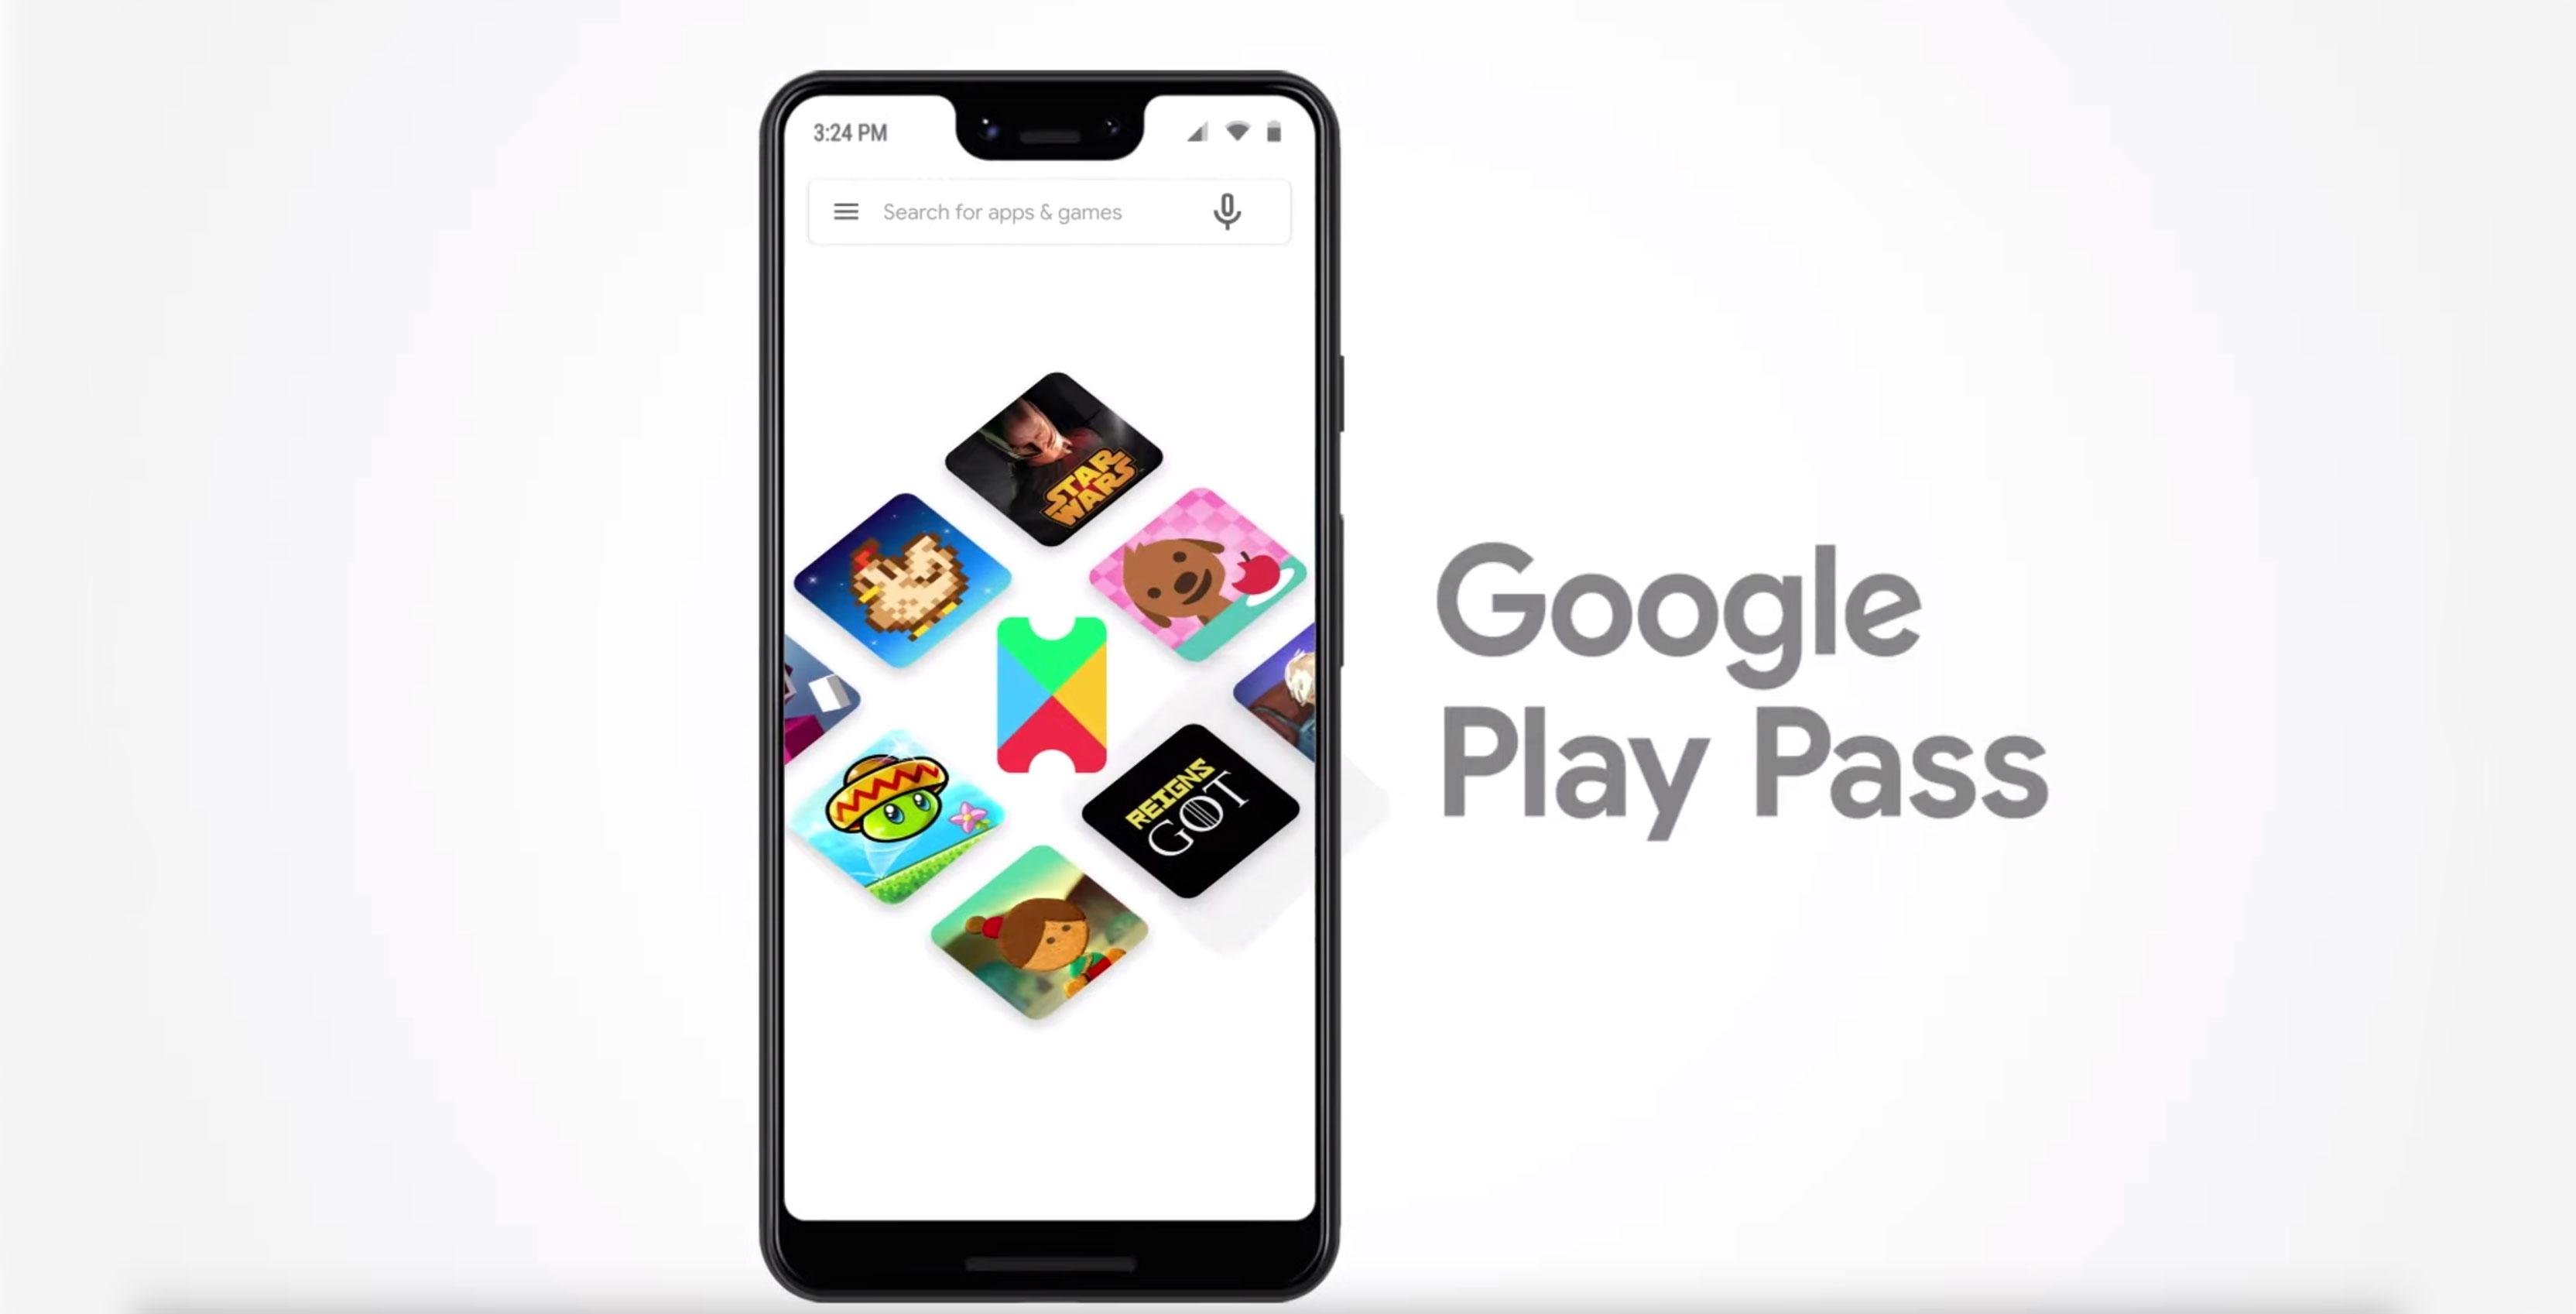 غوغل تُوفّر خدمة طال انتظارها باشتراك شهري  Google-play-pass